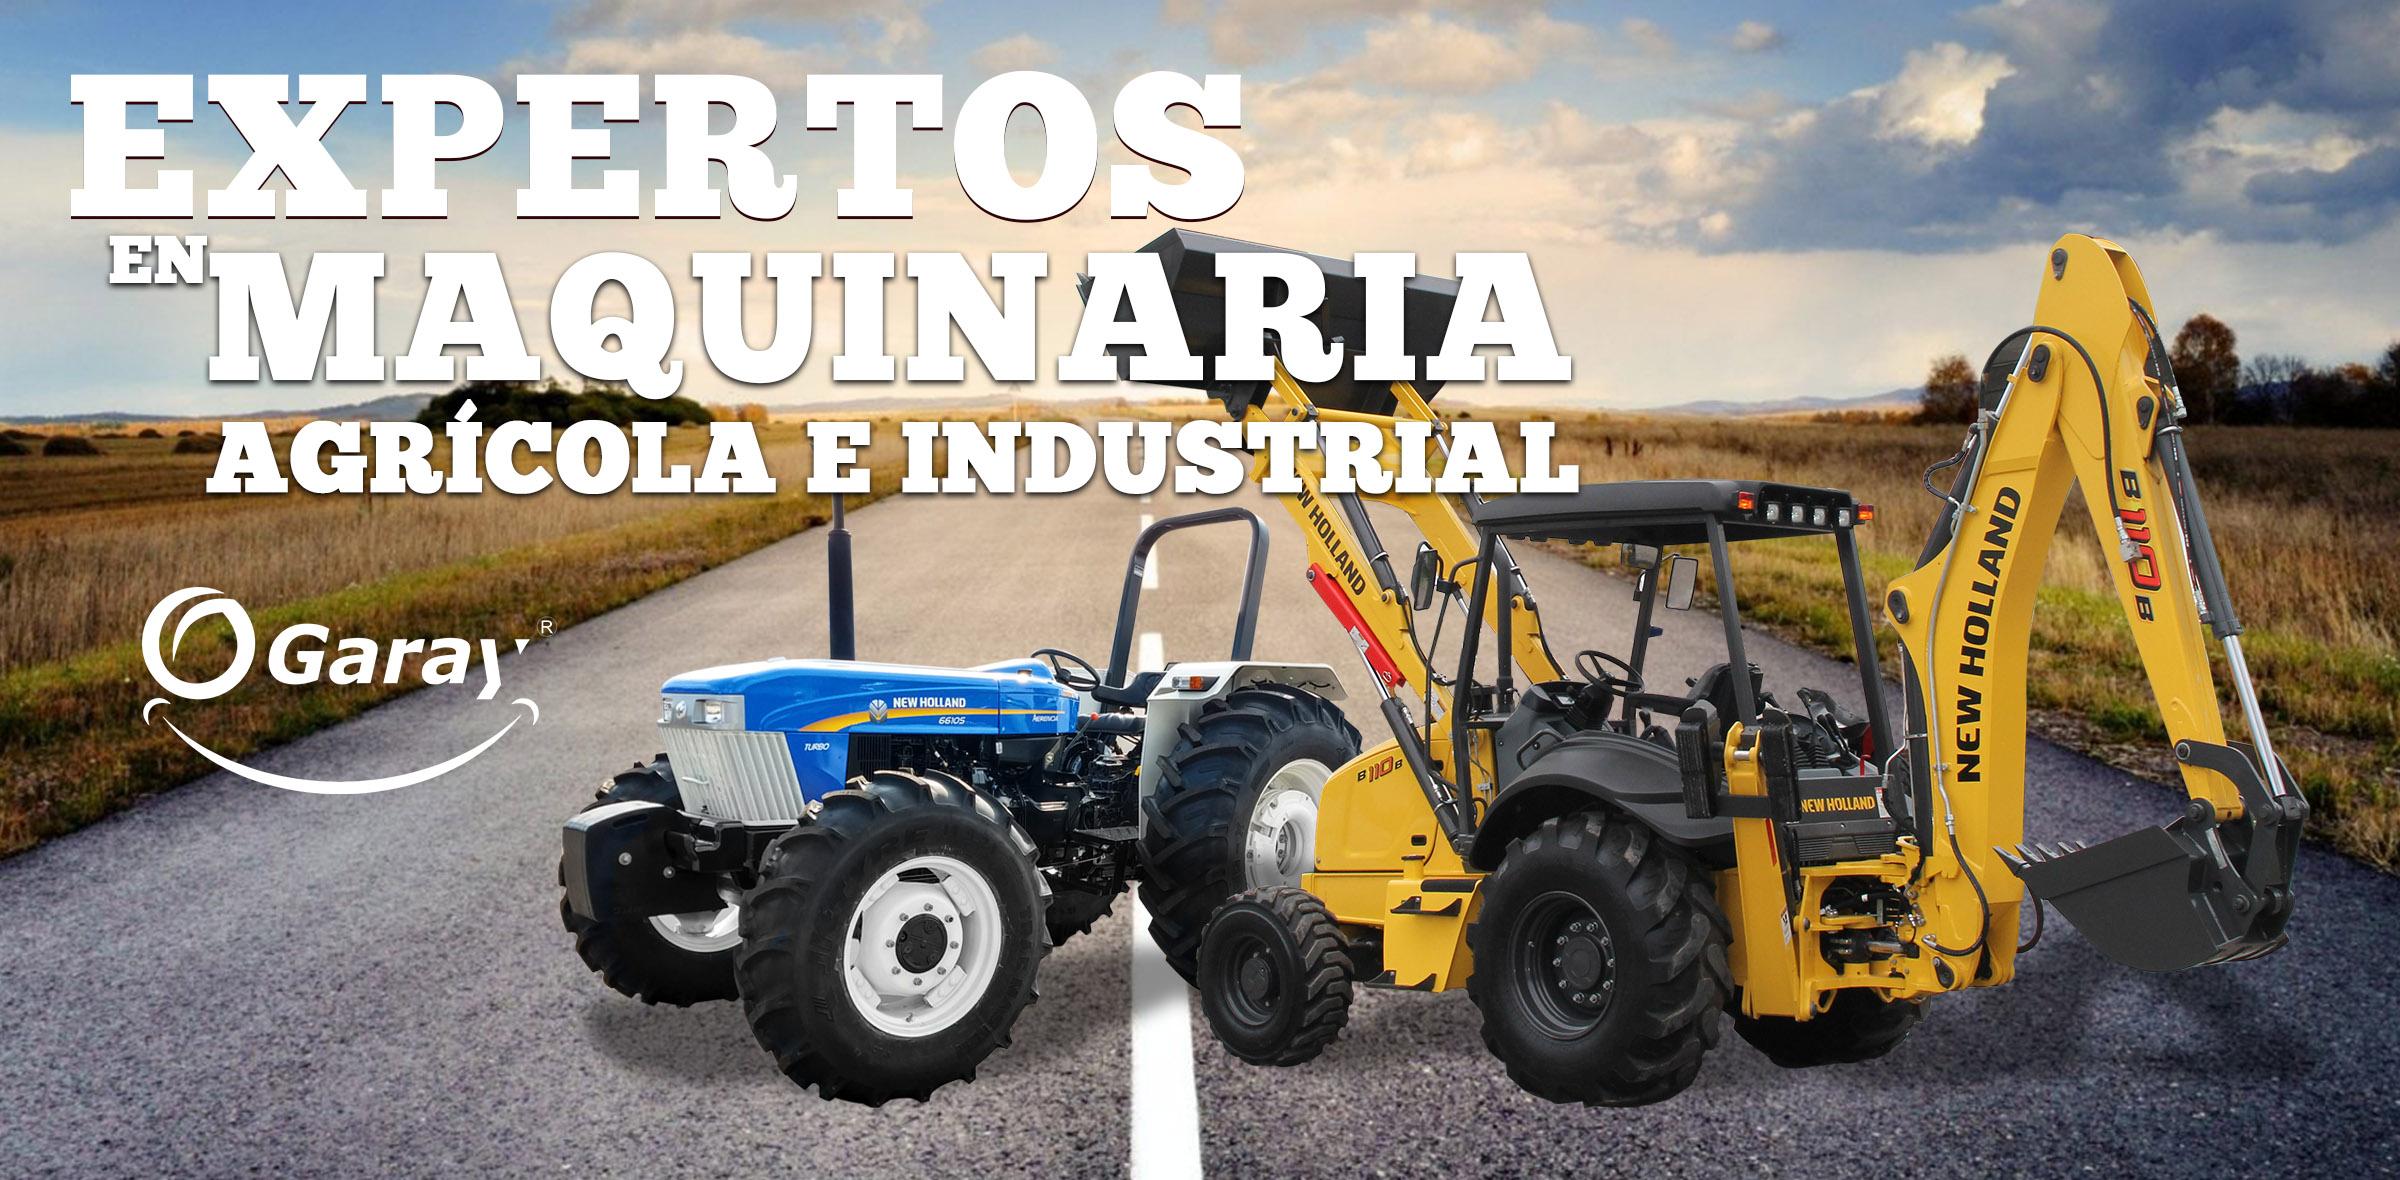 BANNER PRINCIPAL PAGINA WEB EXPERTOS EN MAQUINARIA AGRICOLA E INDUSTRIAL